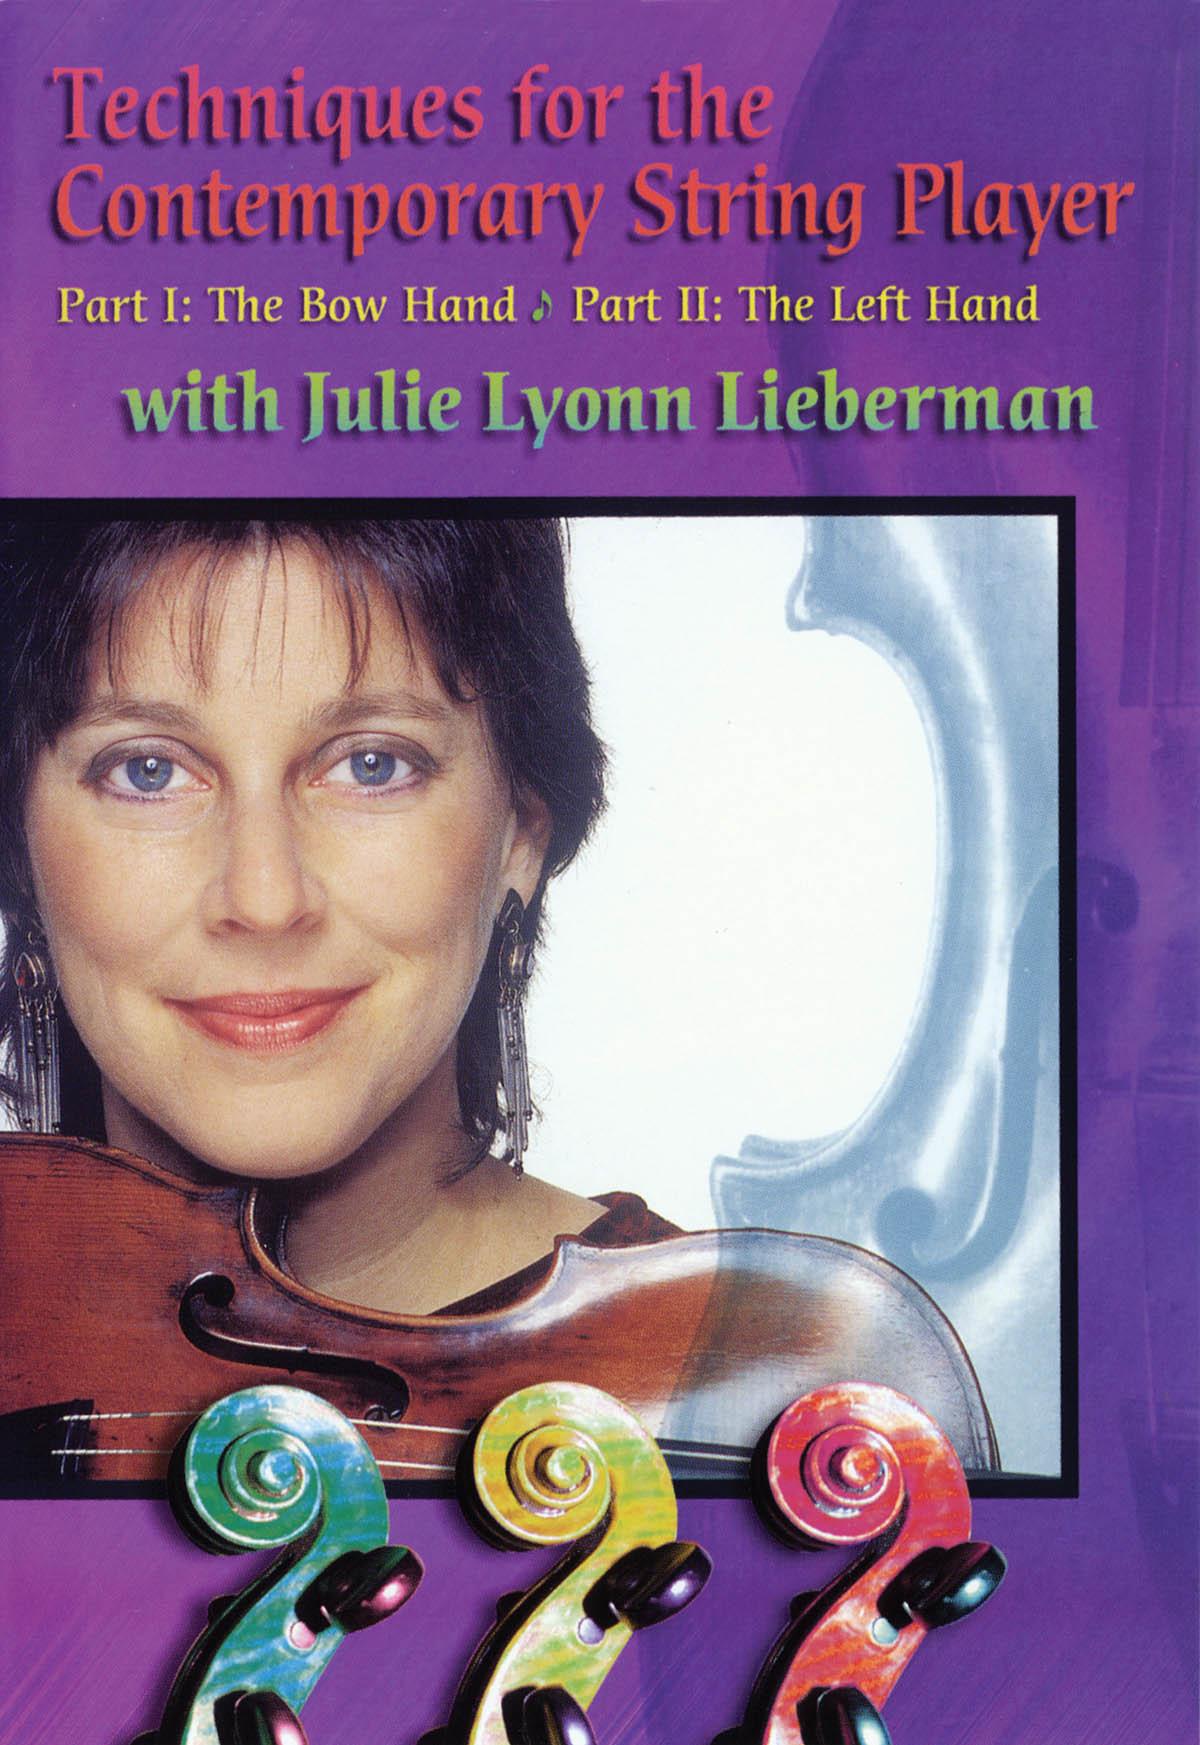 Julie Lyonn Lieberman: Techniques for the Contemporary String Player: Violin